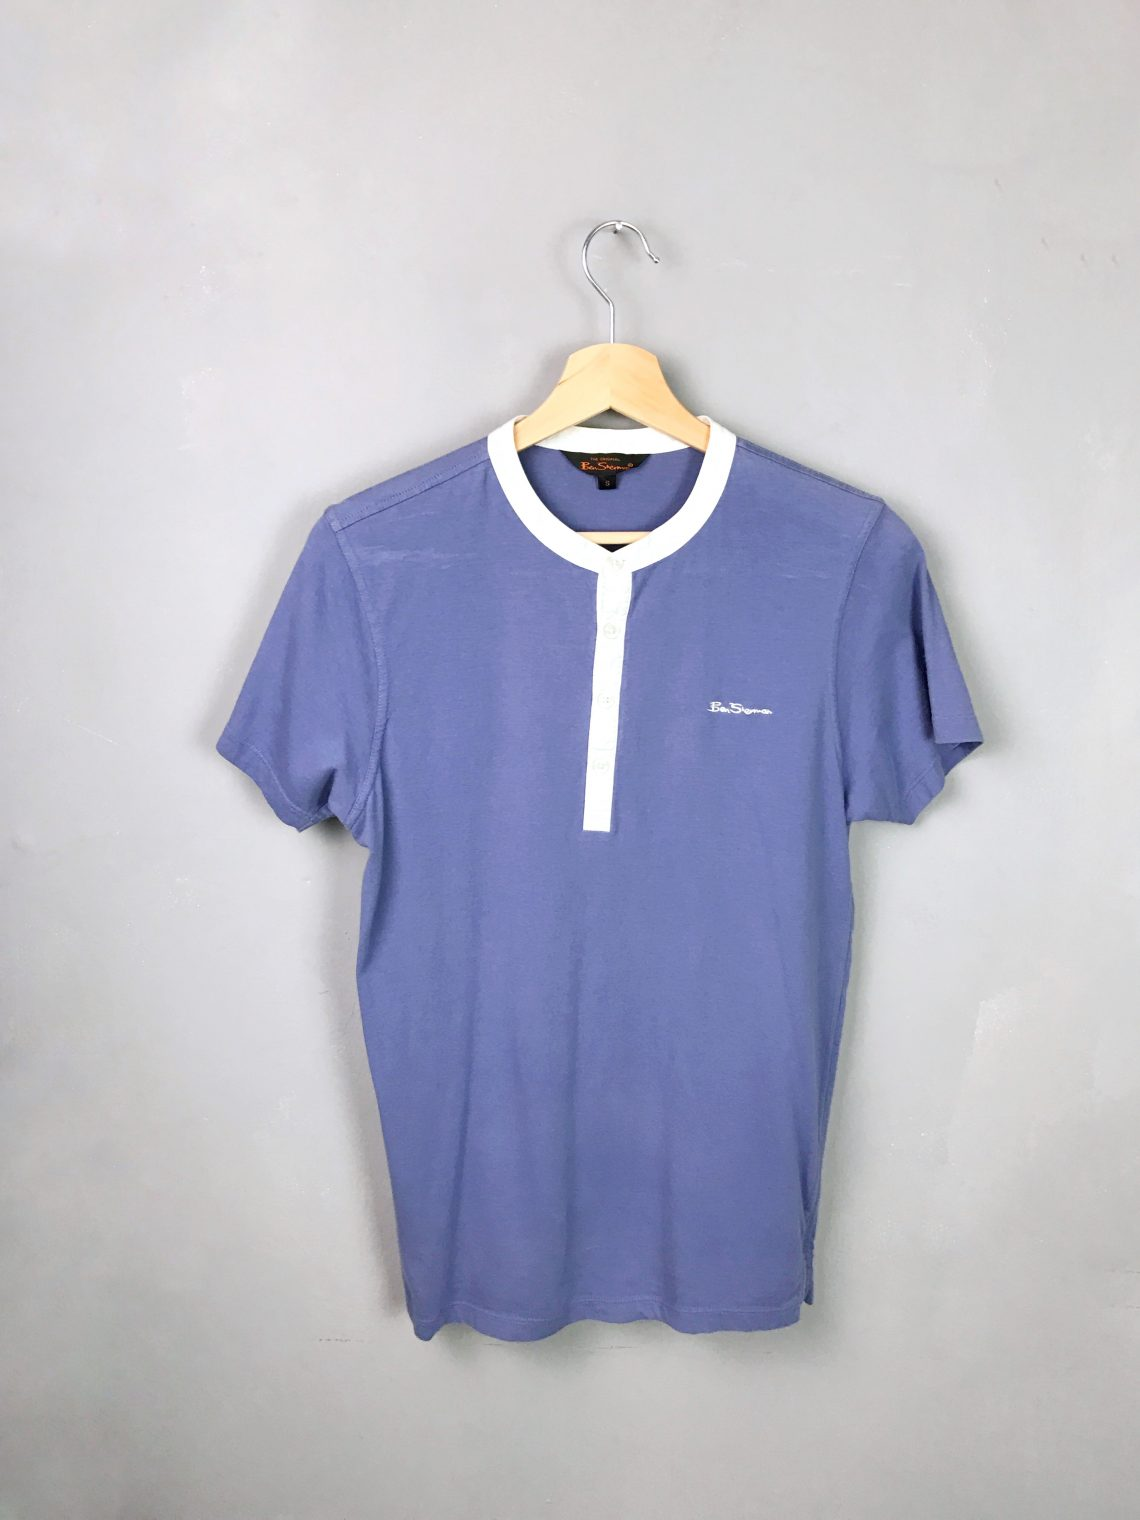 BEN SHERMAN T-Shirt purple blue white collar